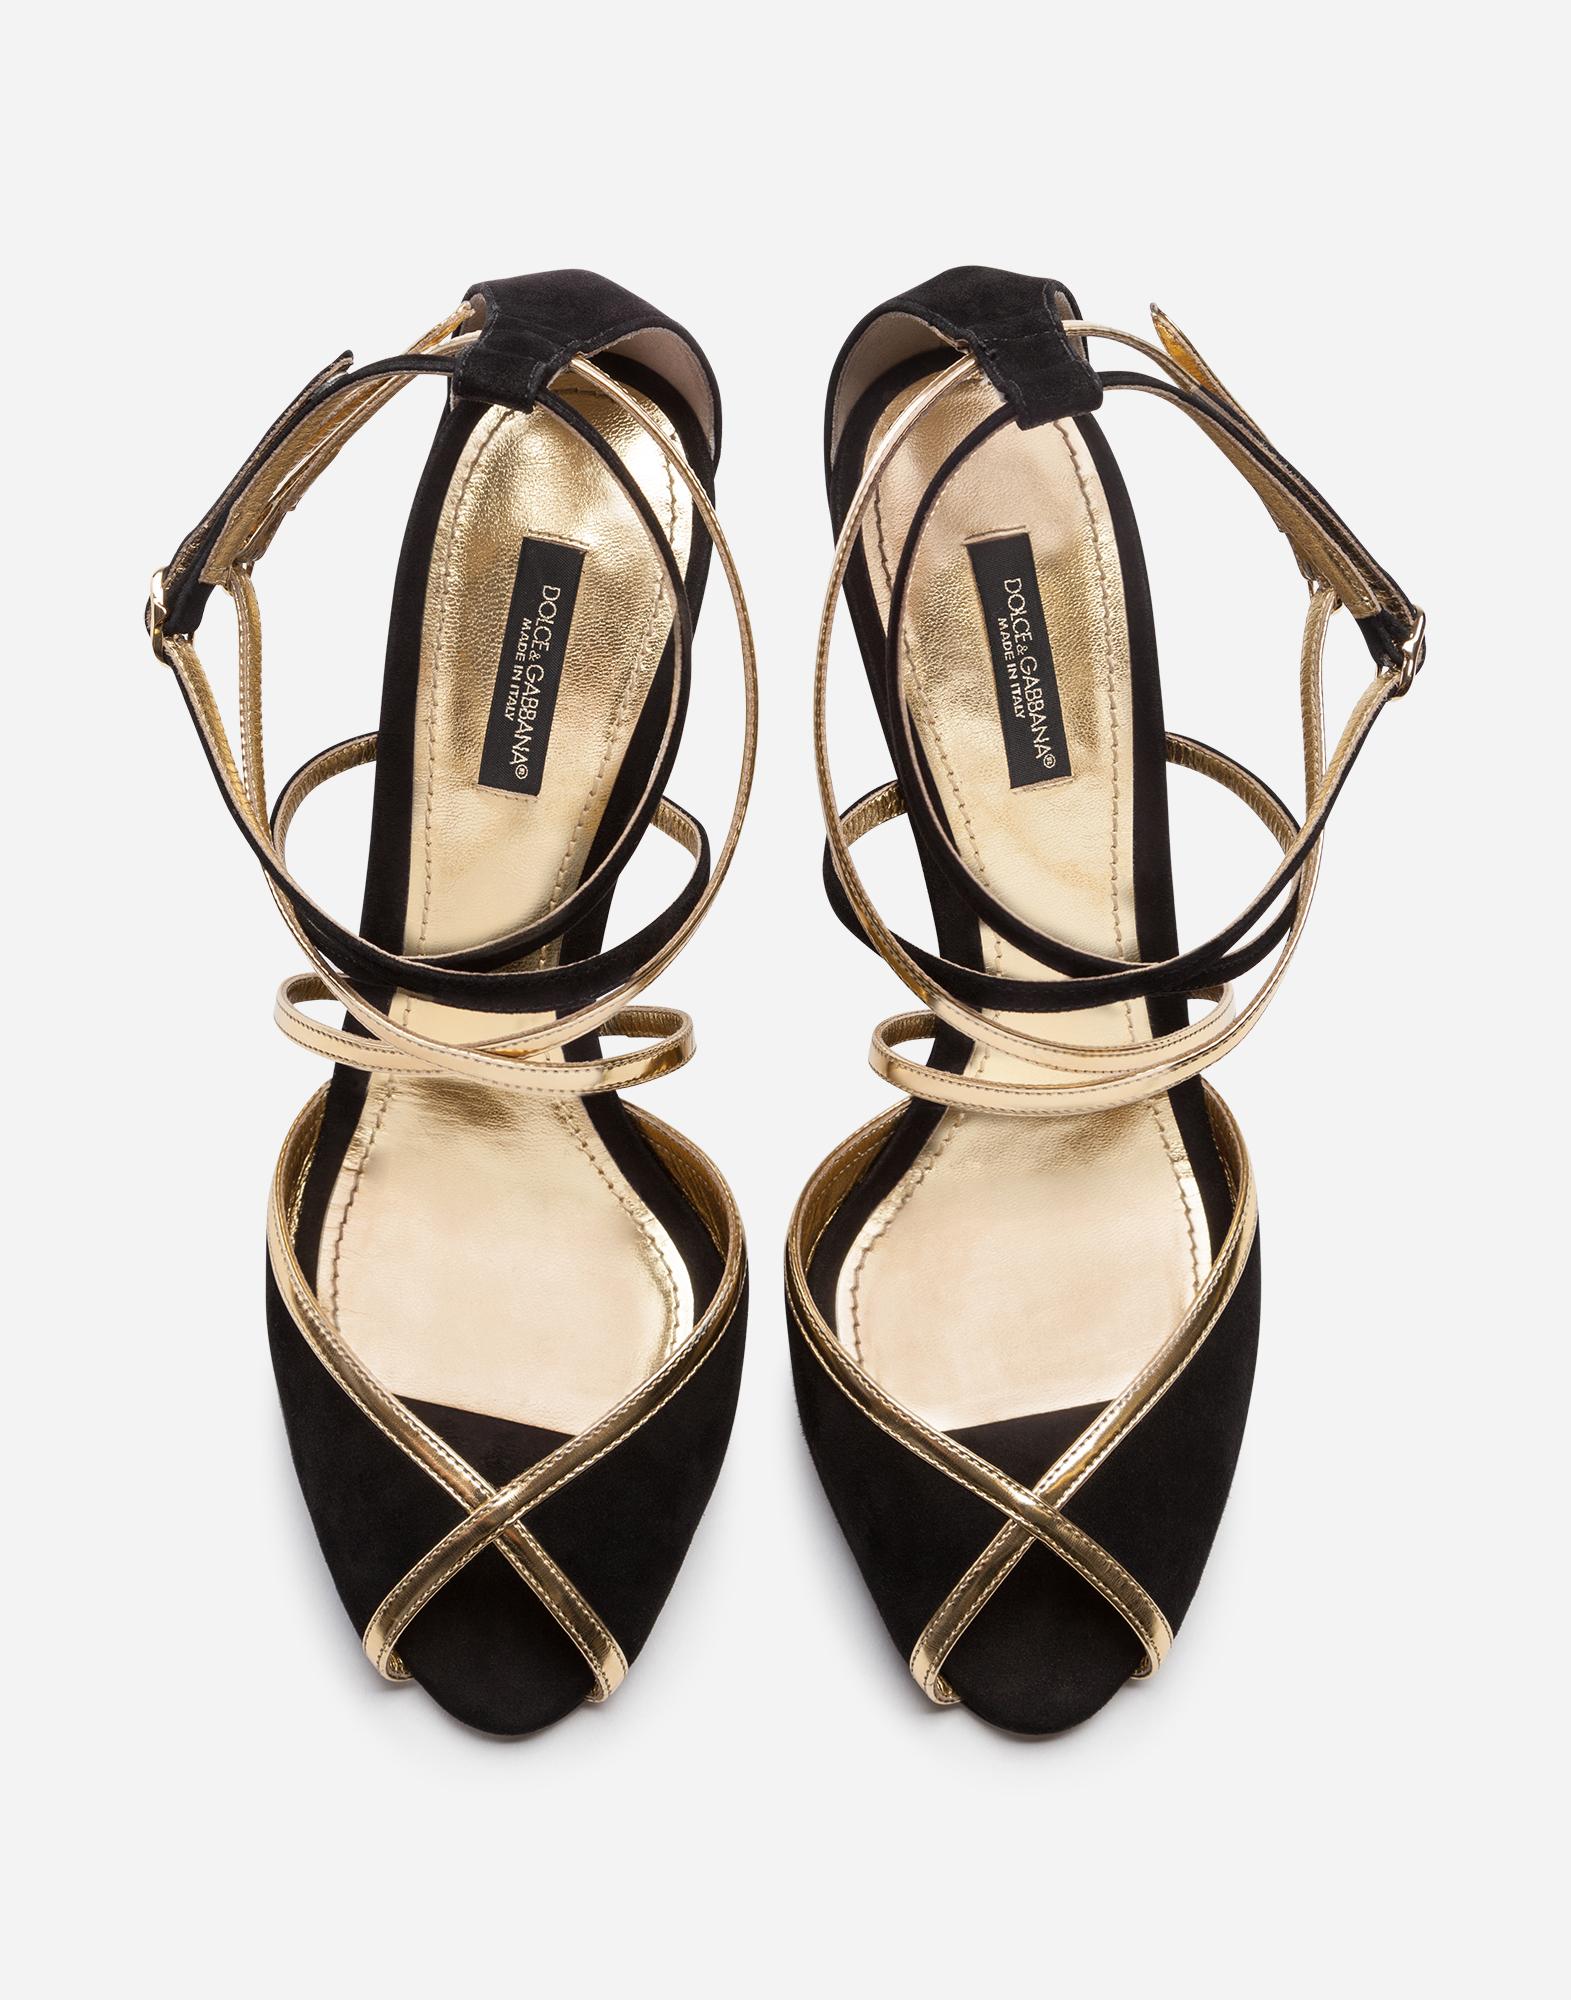 Dolce & Gabbana SANDALS IN A MIX OF MATERIALS